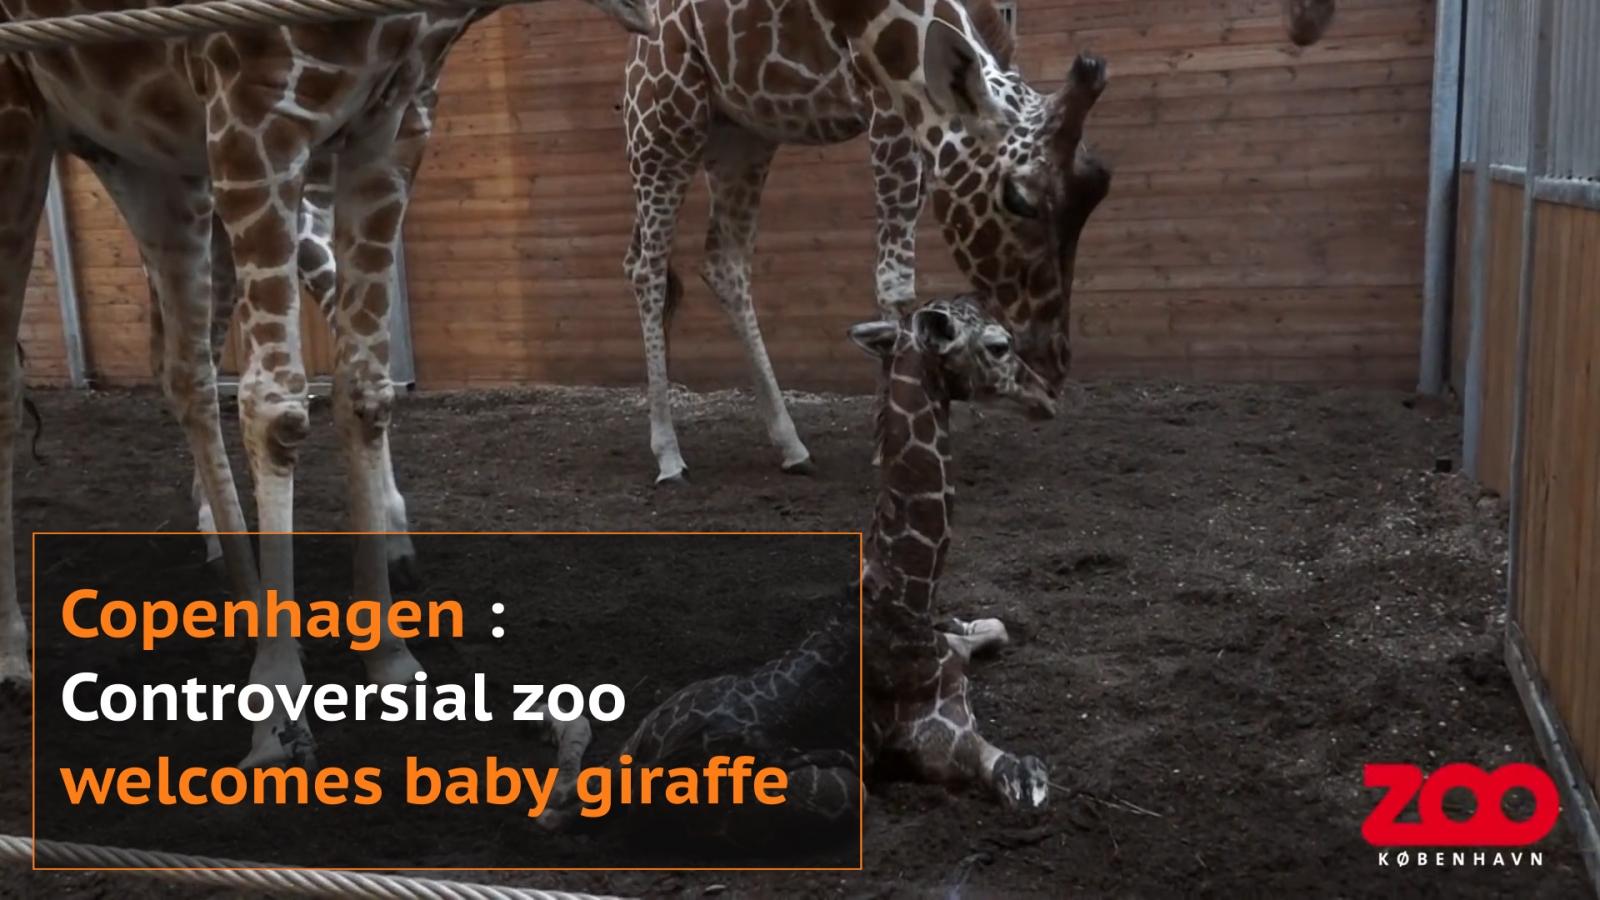 Baby giraffe born in Copenhagen zoo